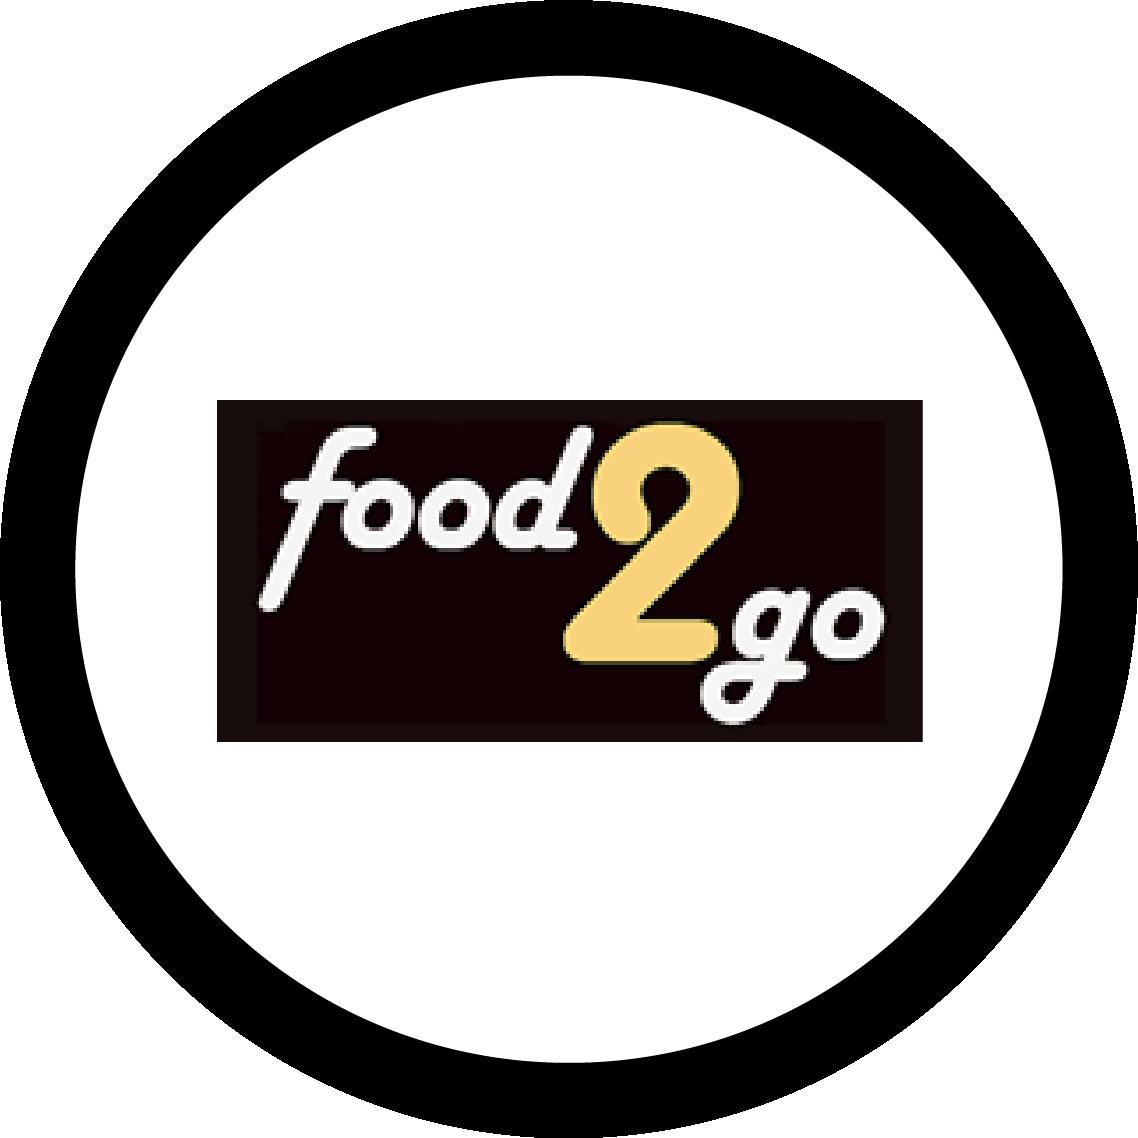 Food2Go Hollerich/Bereldange (Open on Sunday's)